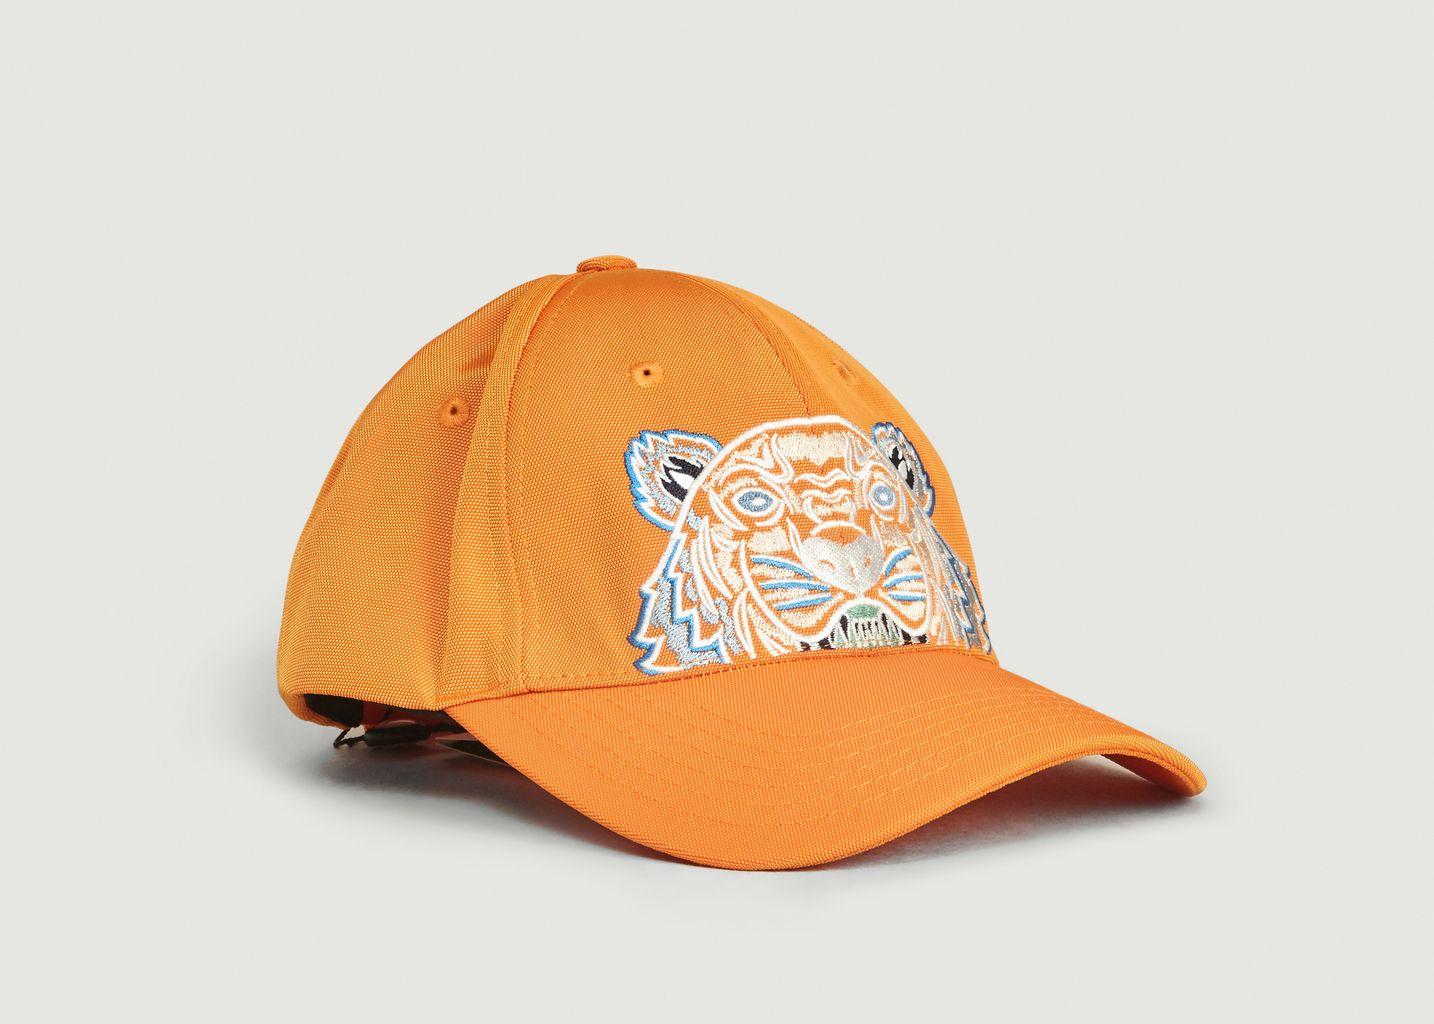 Casquette brodée tigre - Kenzo